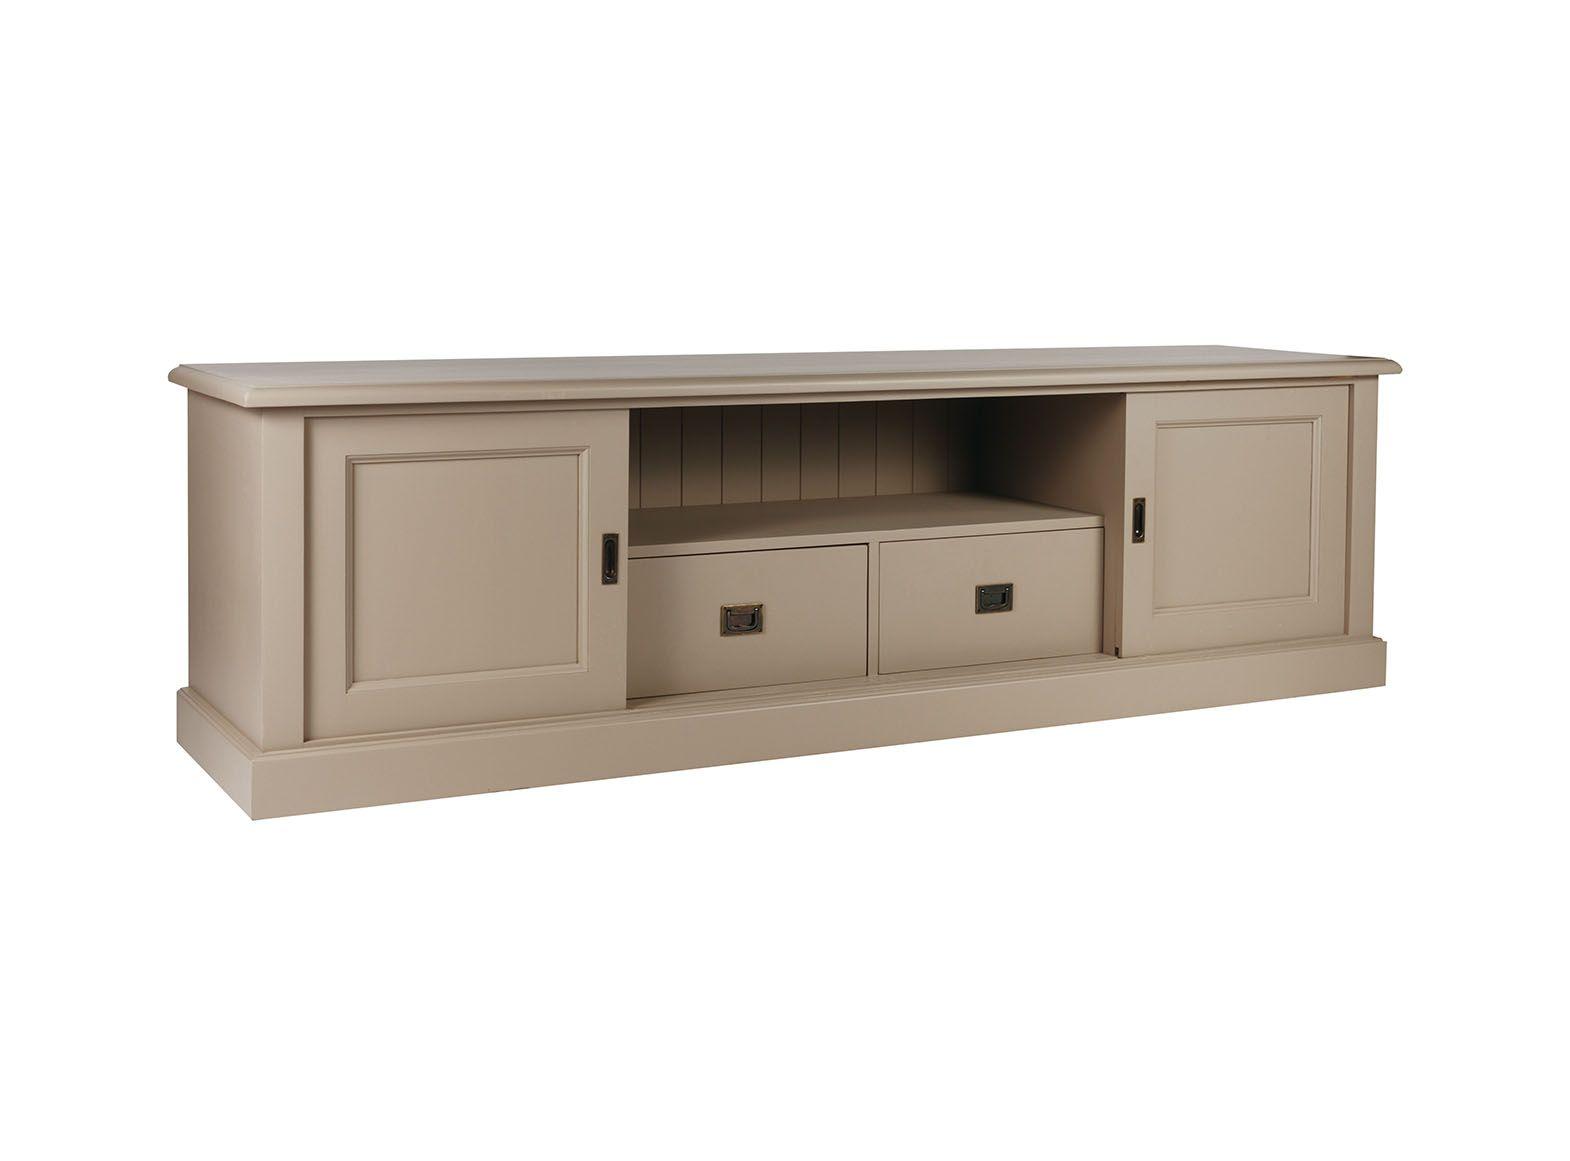 meuble multim dia portes coulissantes 2 tiroirs jiceka d597 inf. Black Bedroom Furniture Sets. Home Design Ideas